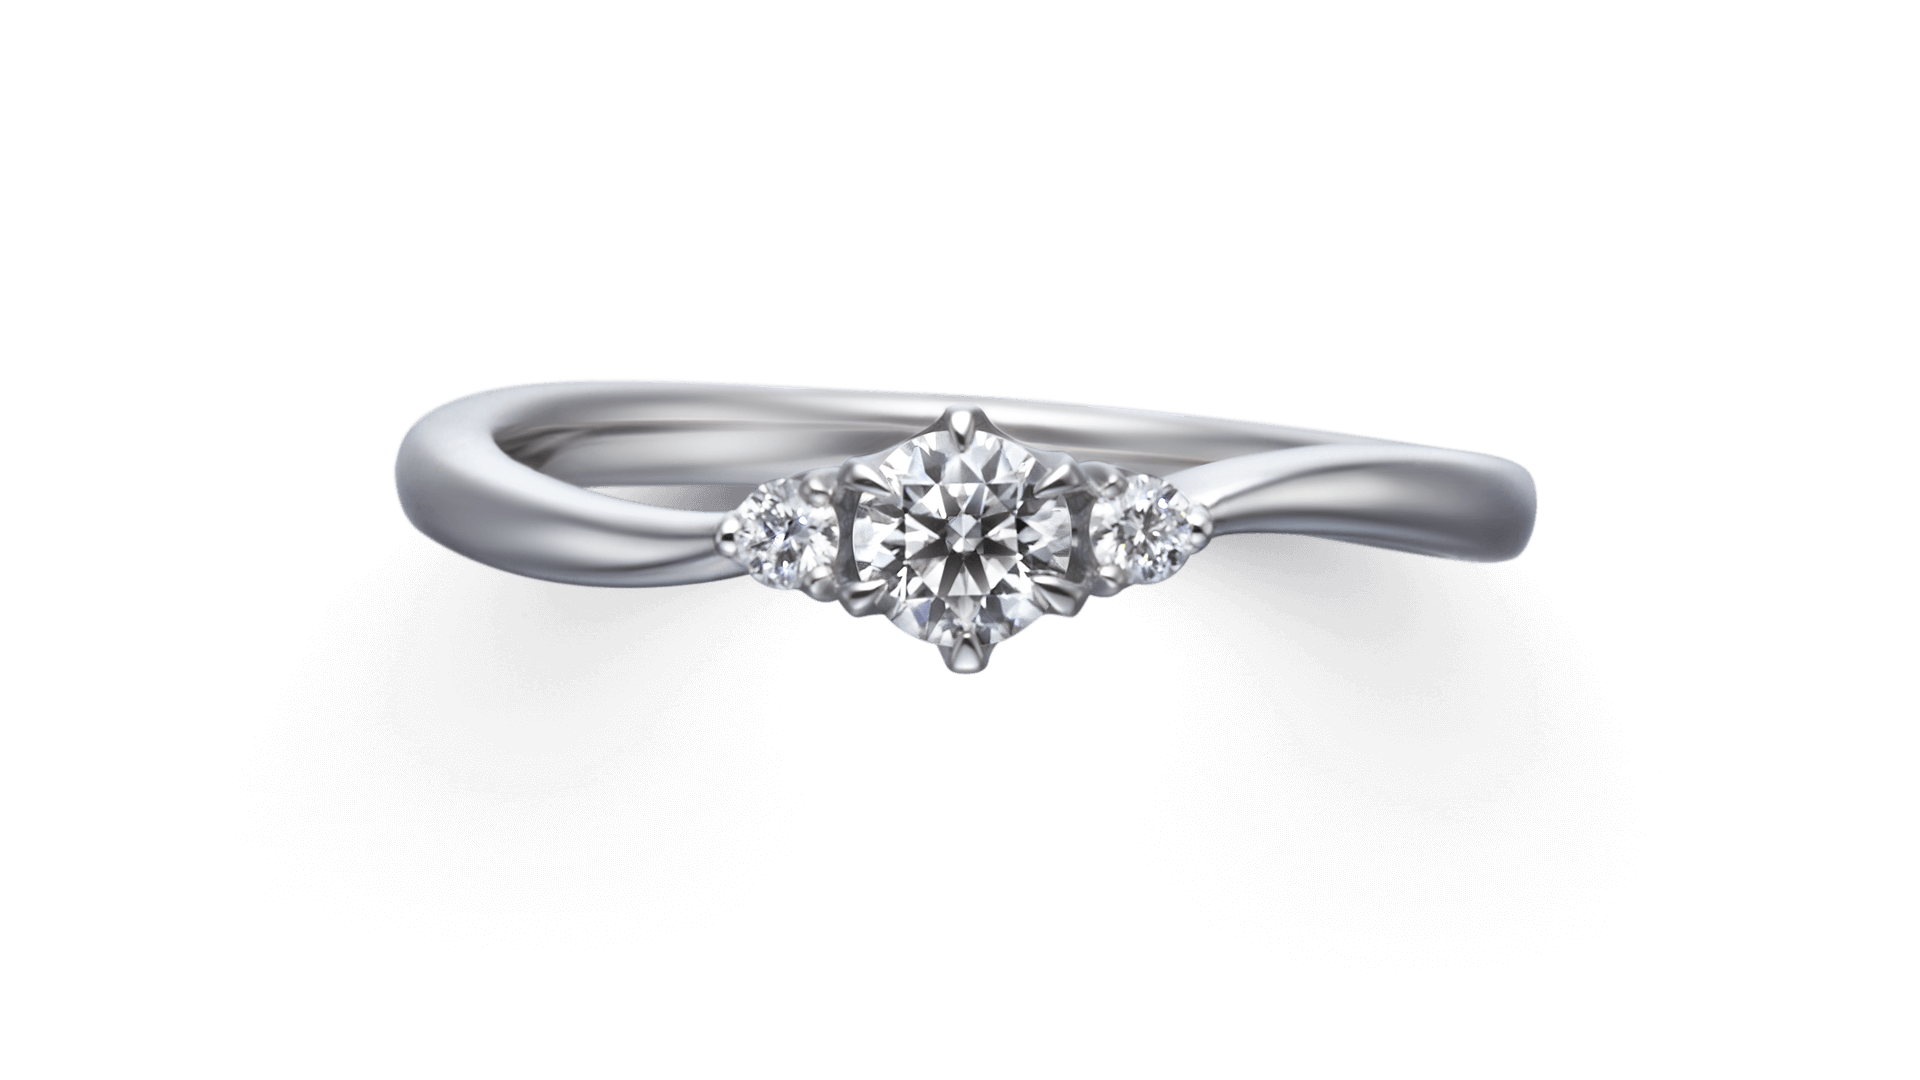 violla ヴィオラ | 婚約指輪サムネイル 1